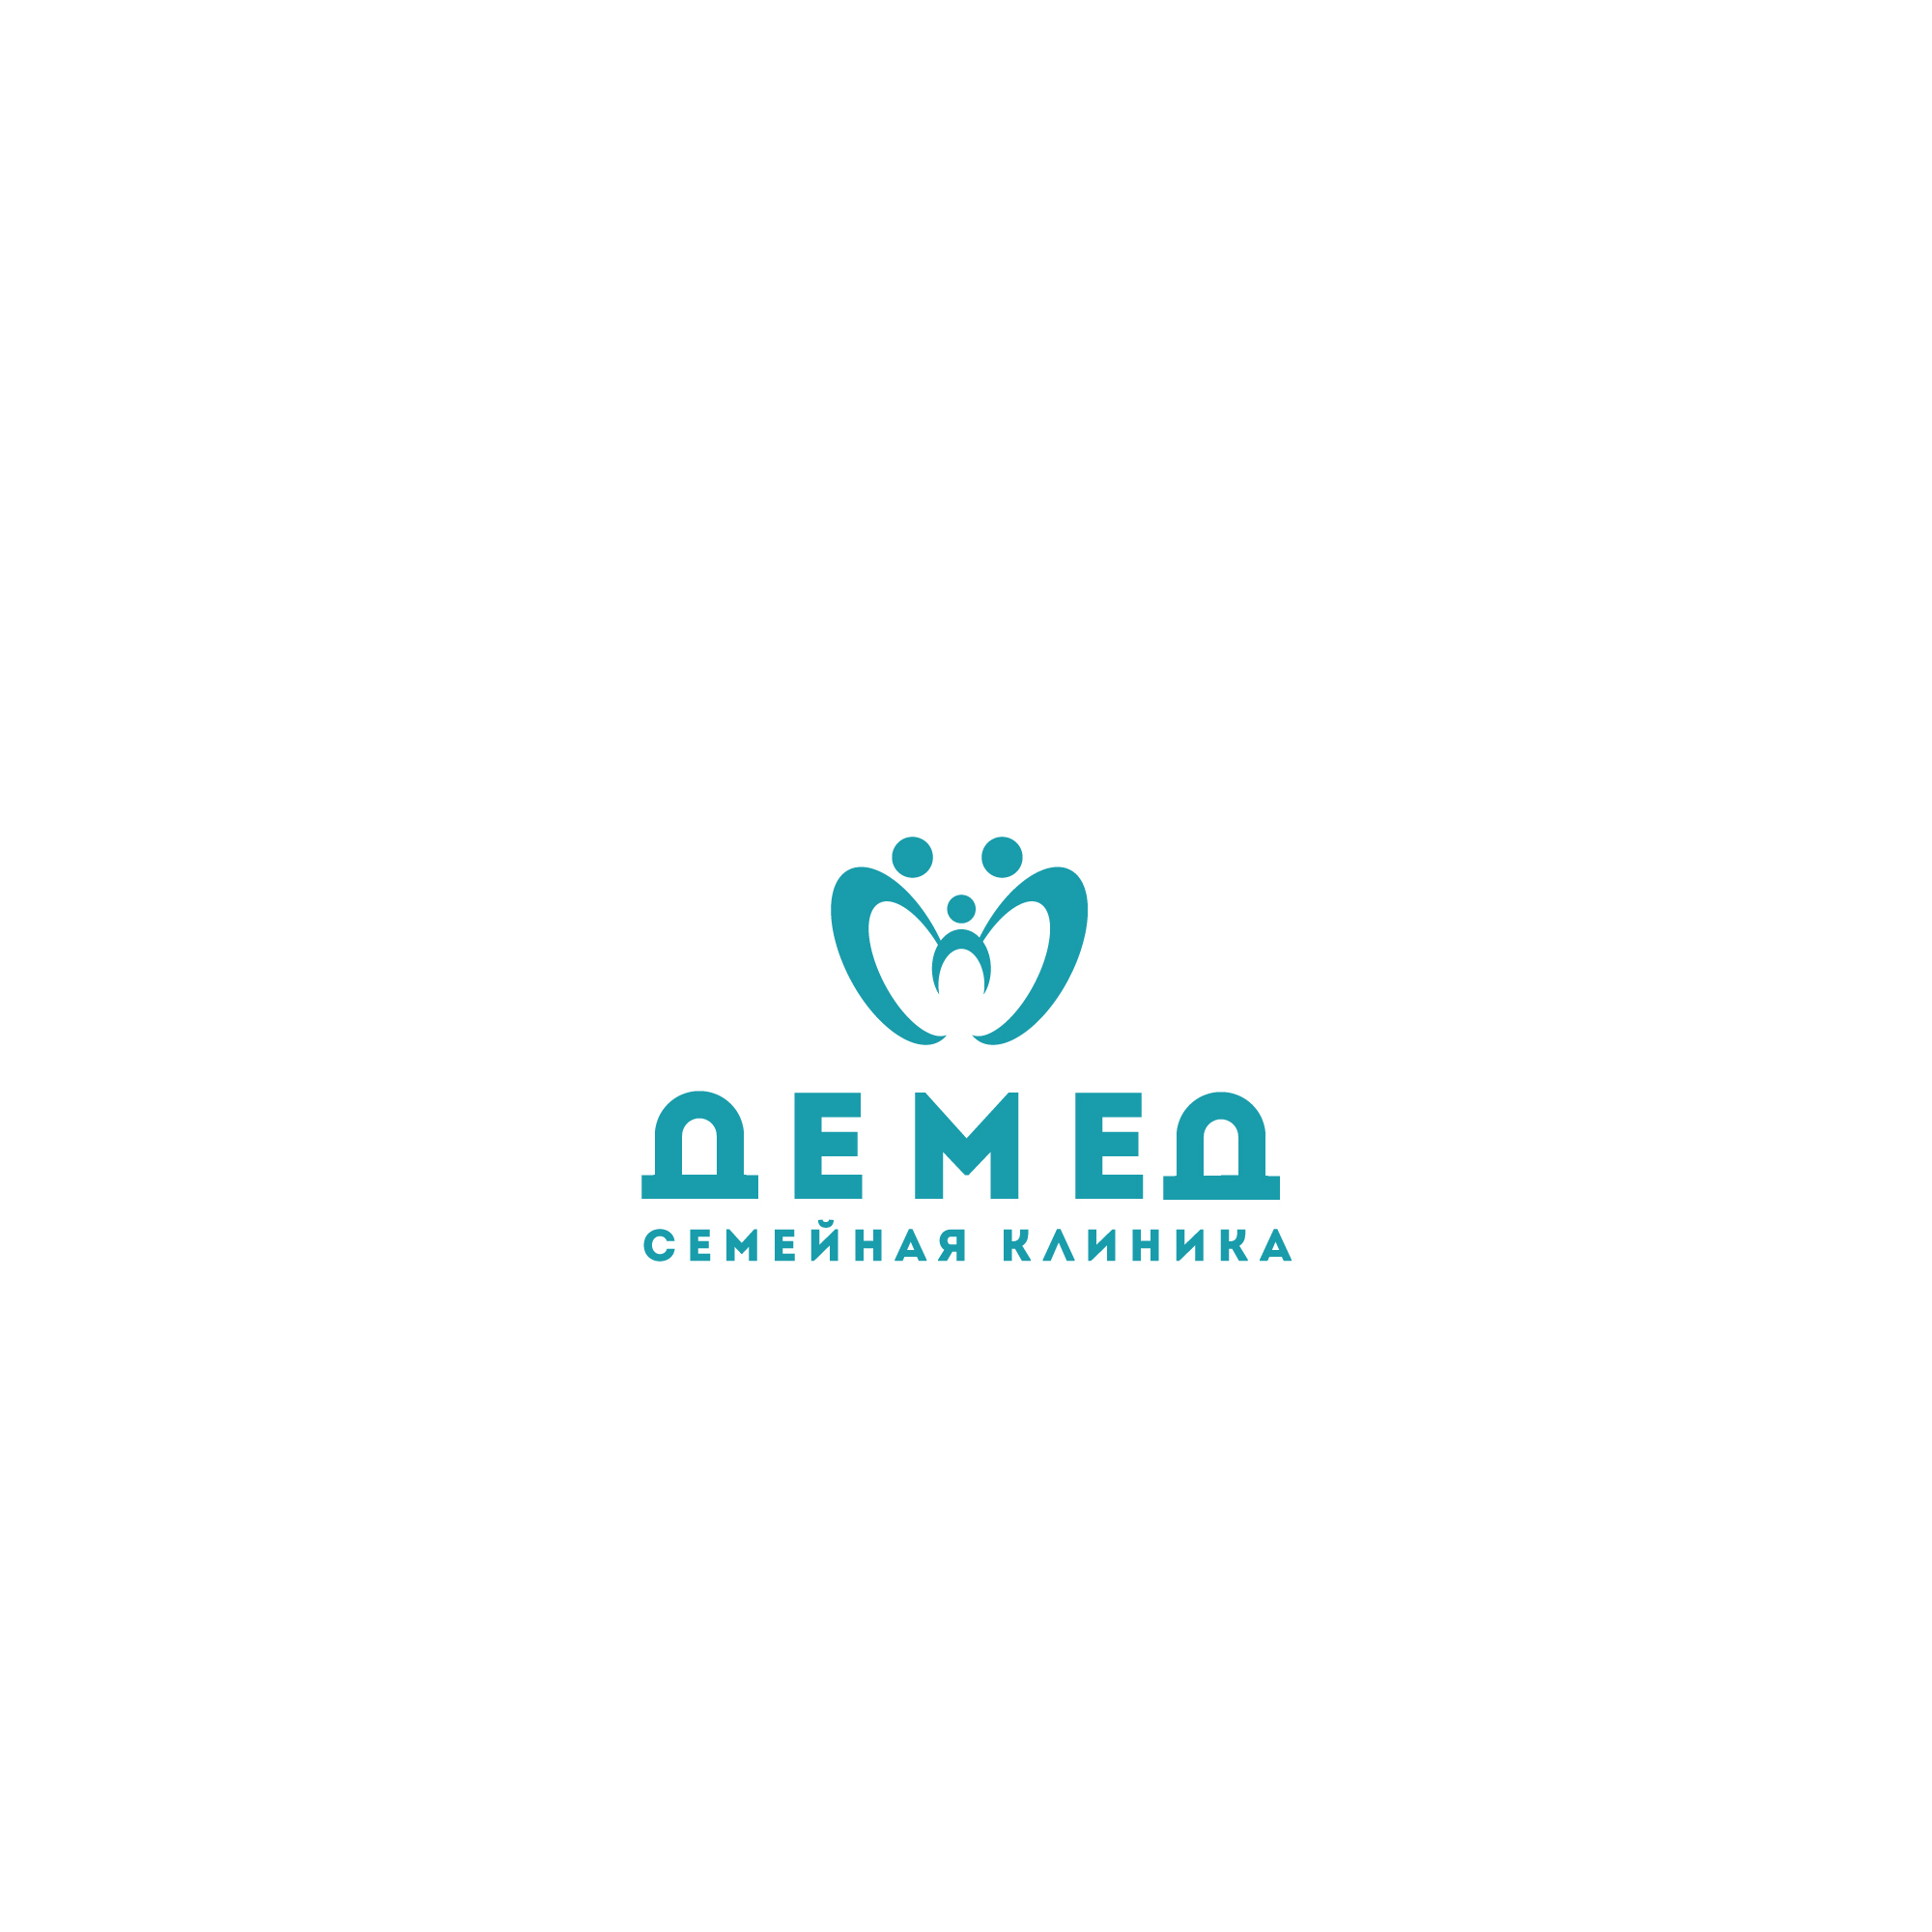 Логотип медицинского центра фото f_7585dcd598c6a8d7.jpg